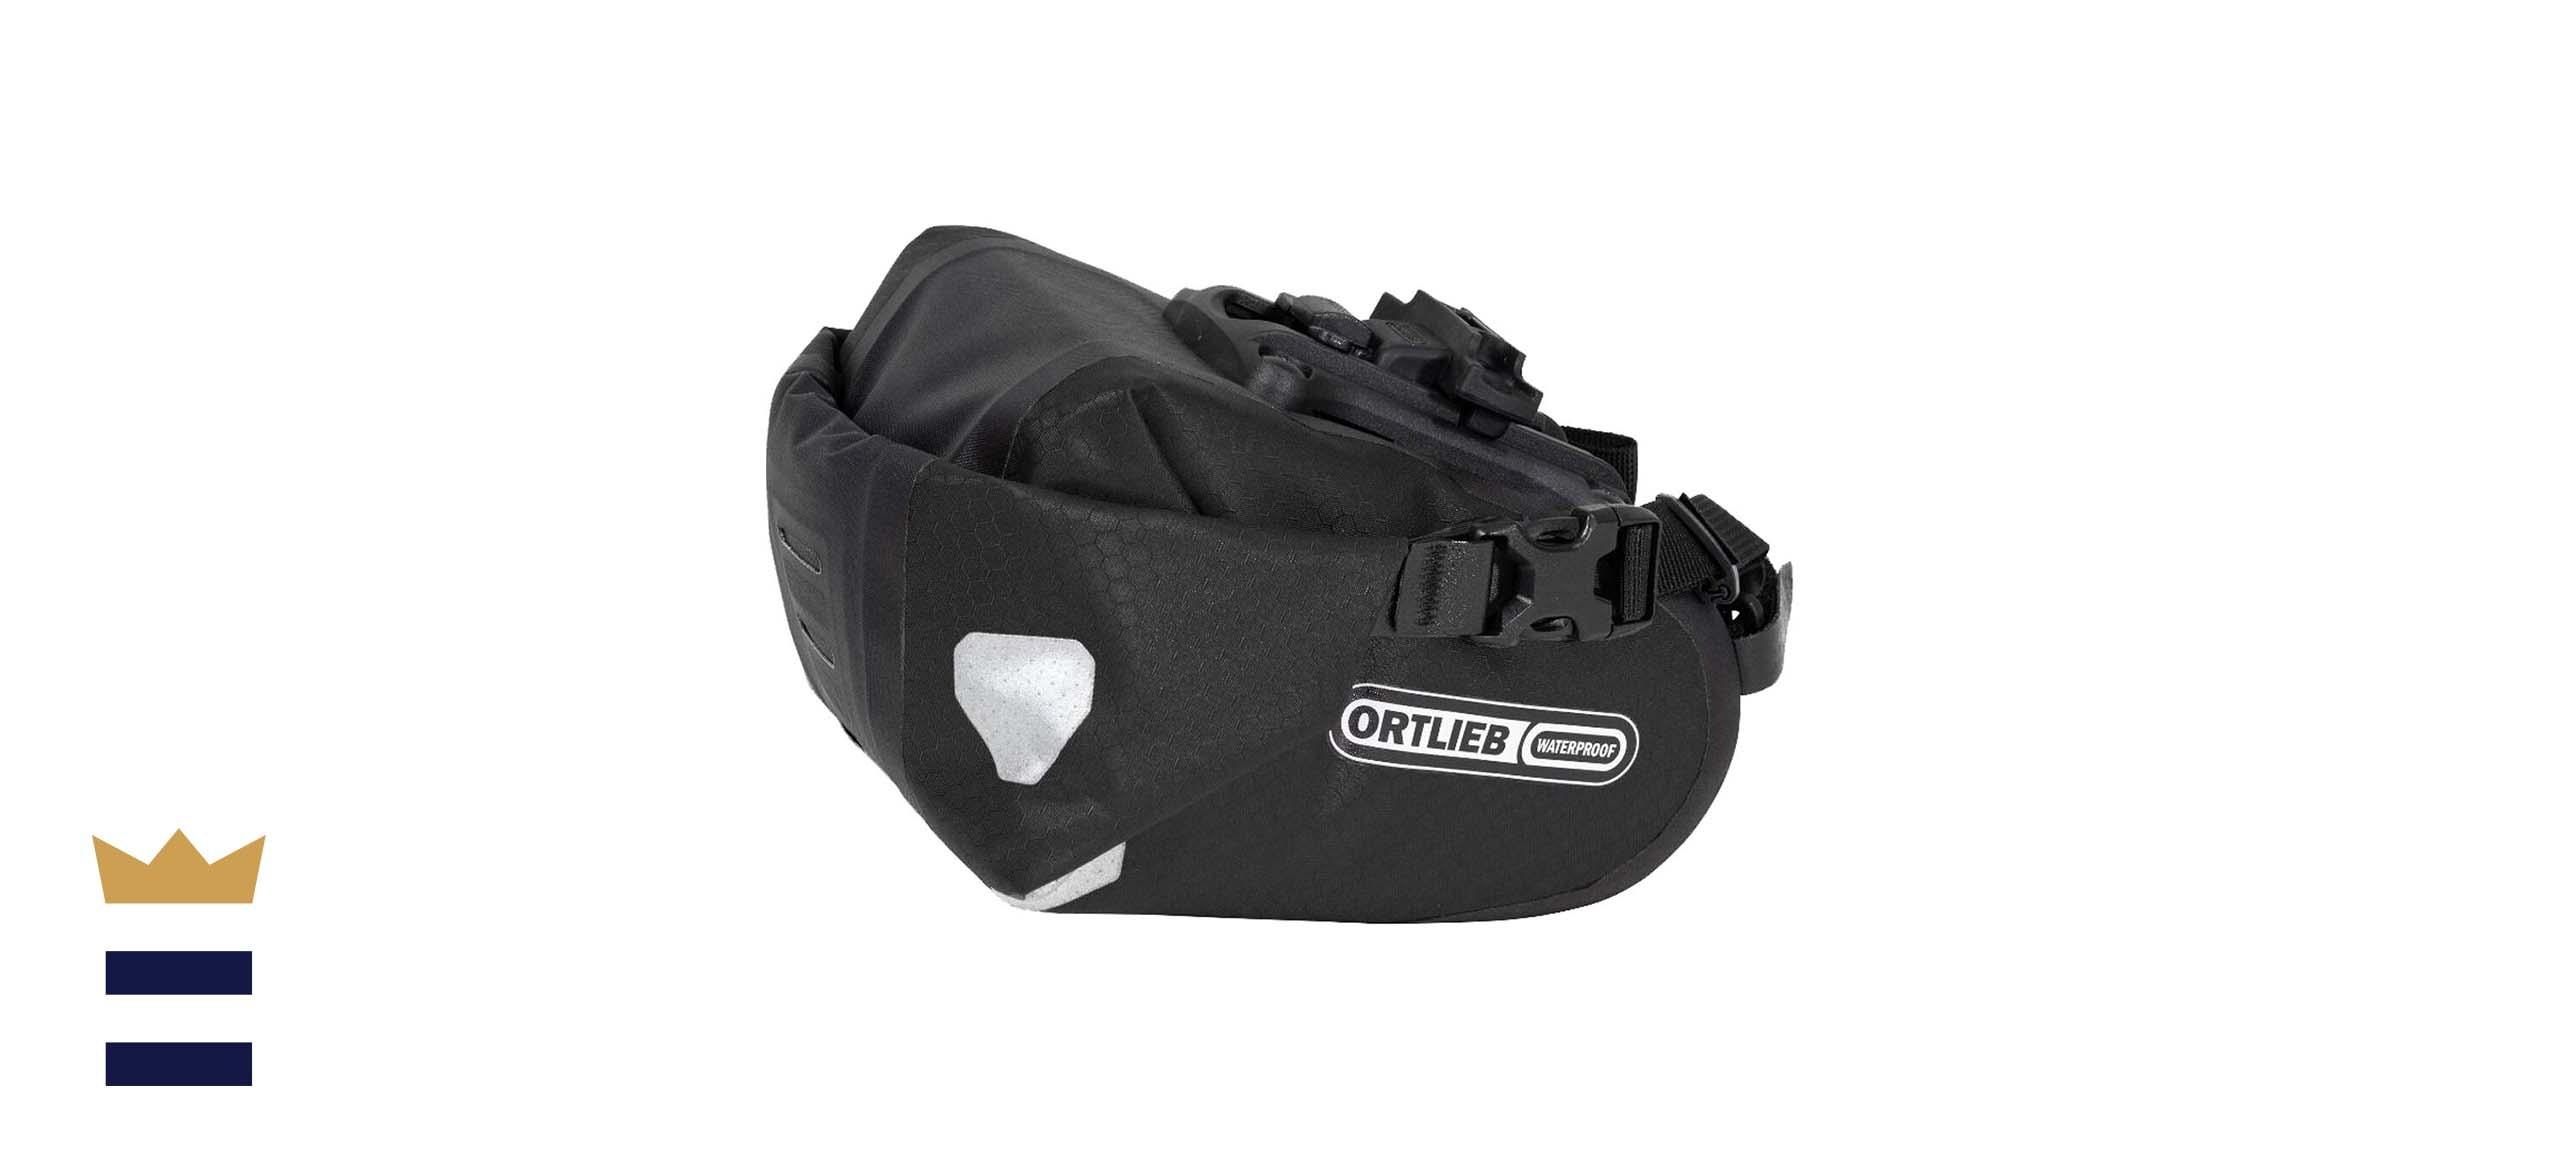 OrtliebSaddle Bag Two